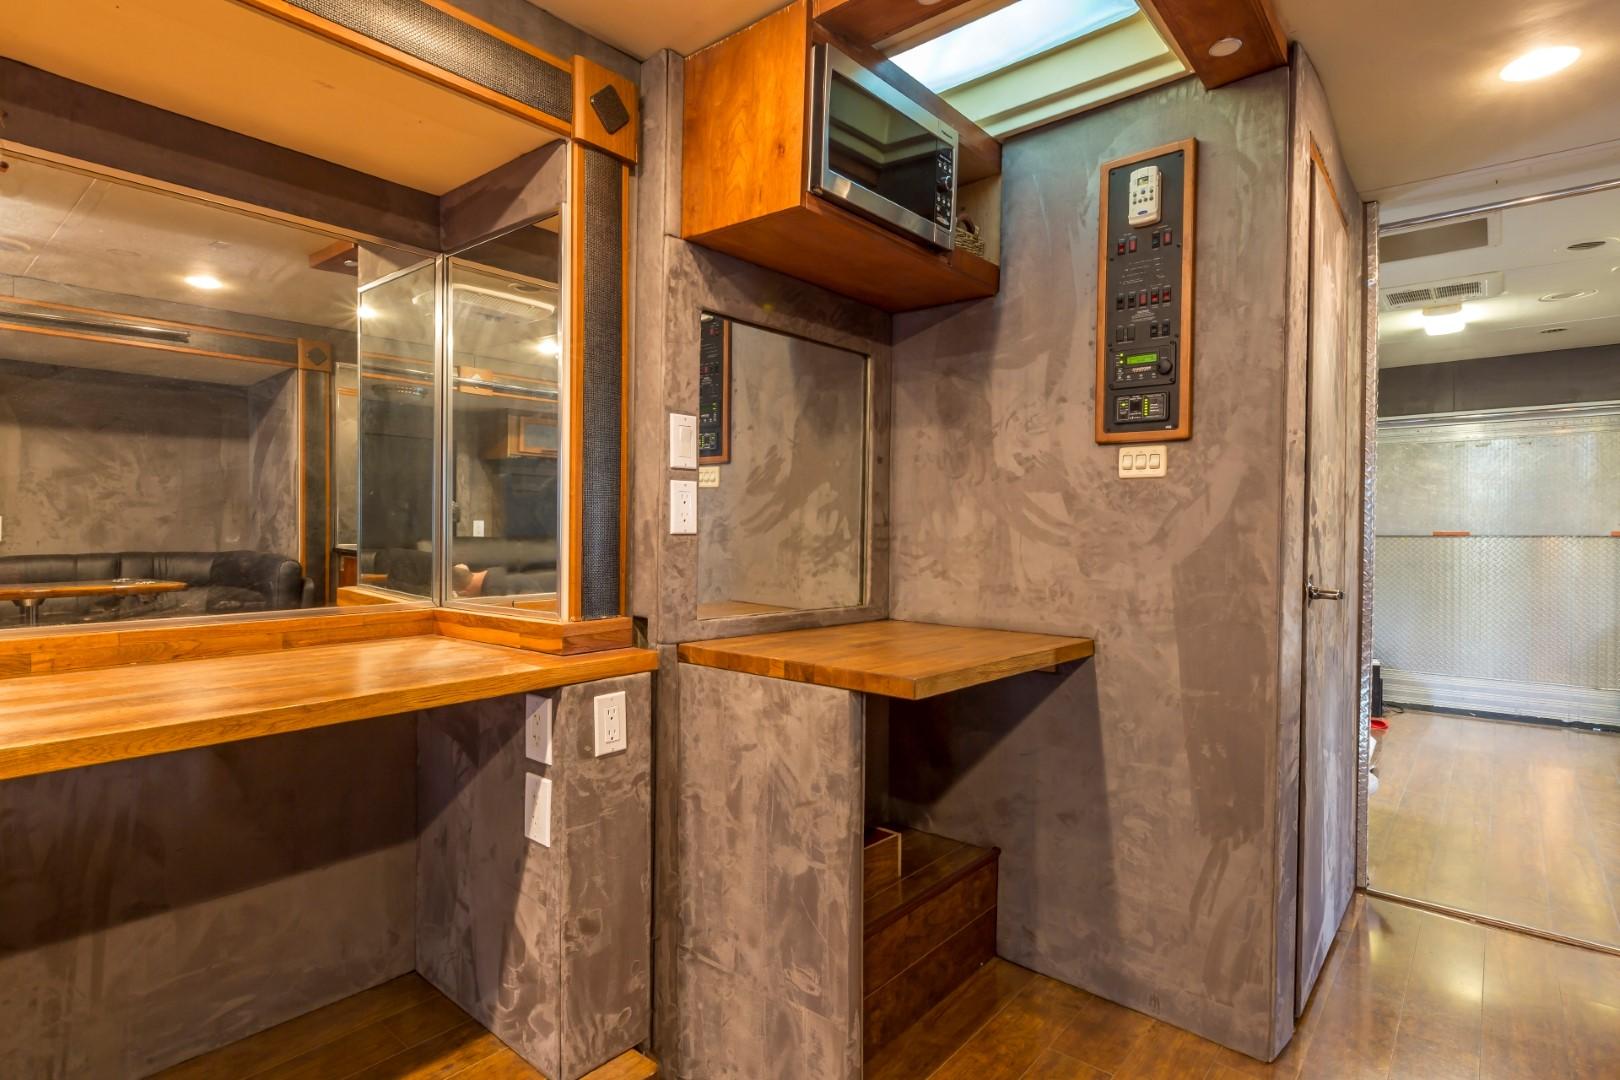 Safari RV Transformed into a Mobile Talent Dressing and Lounge RV